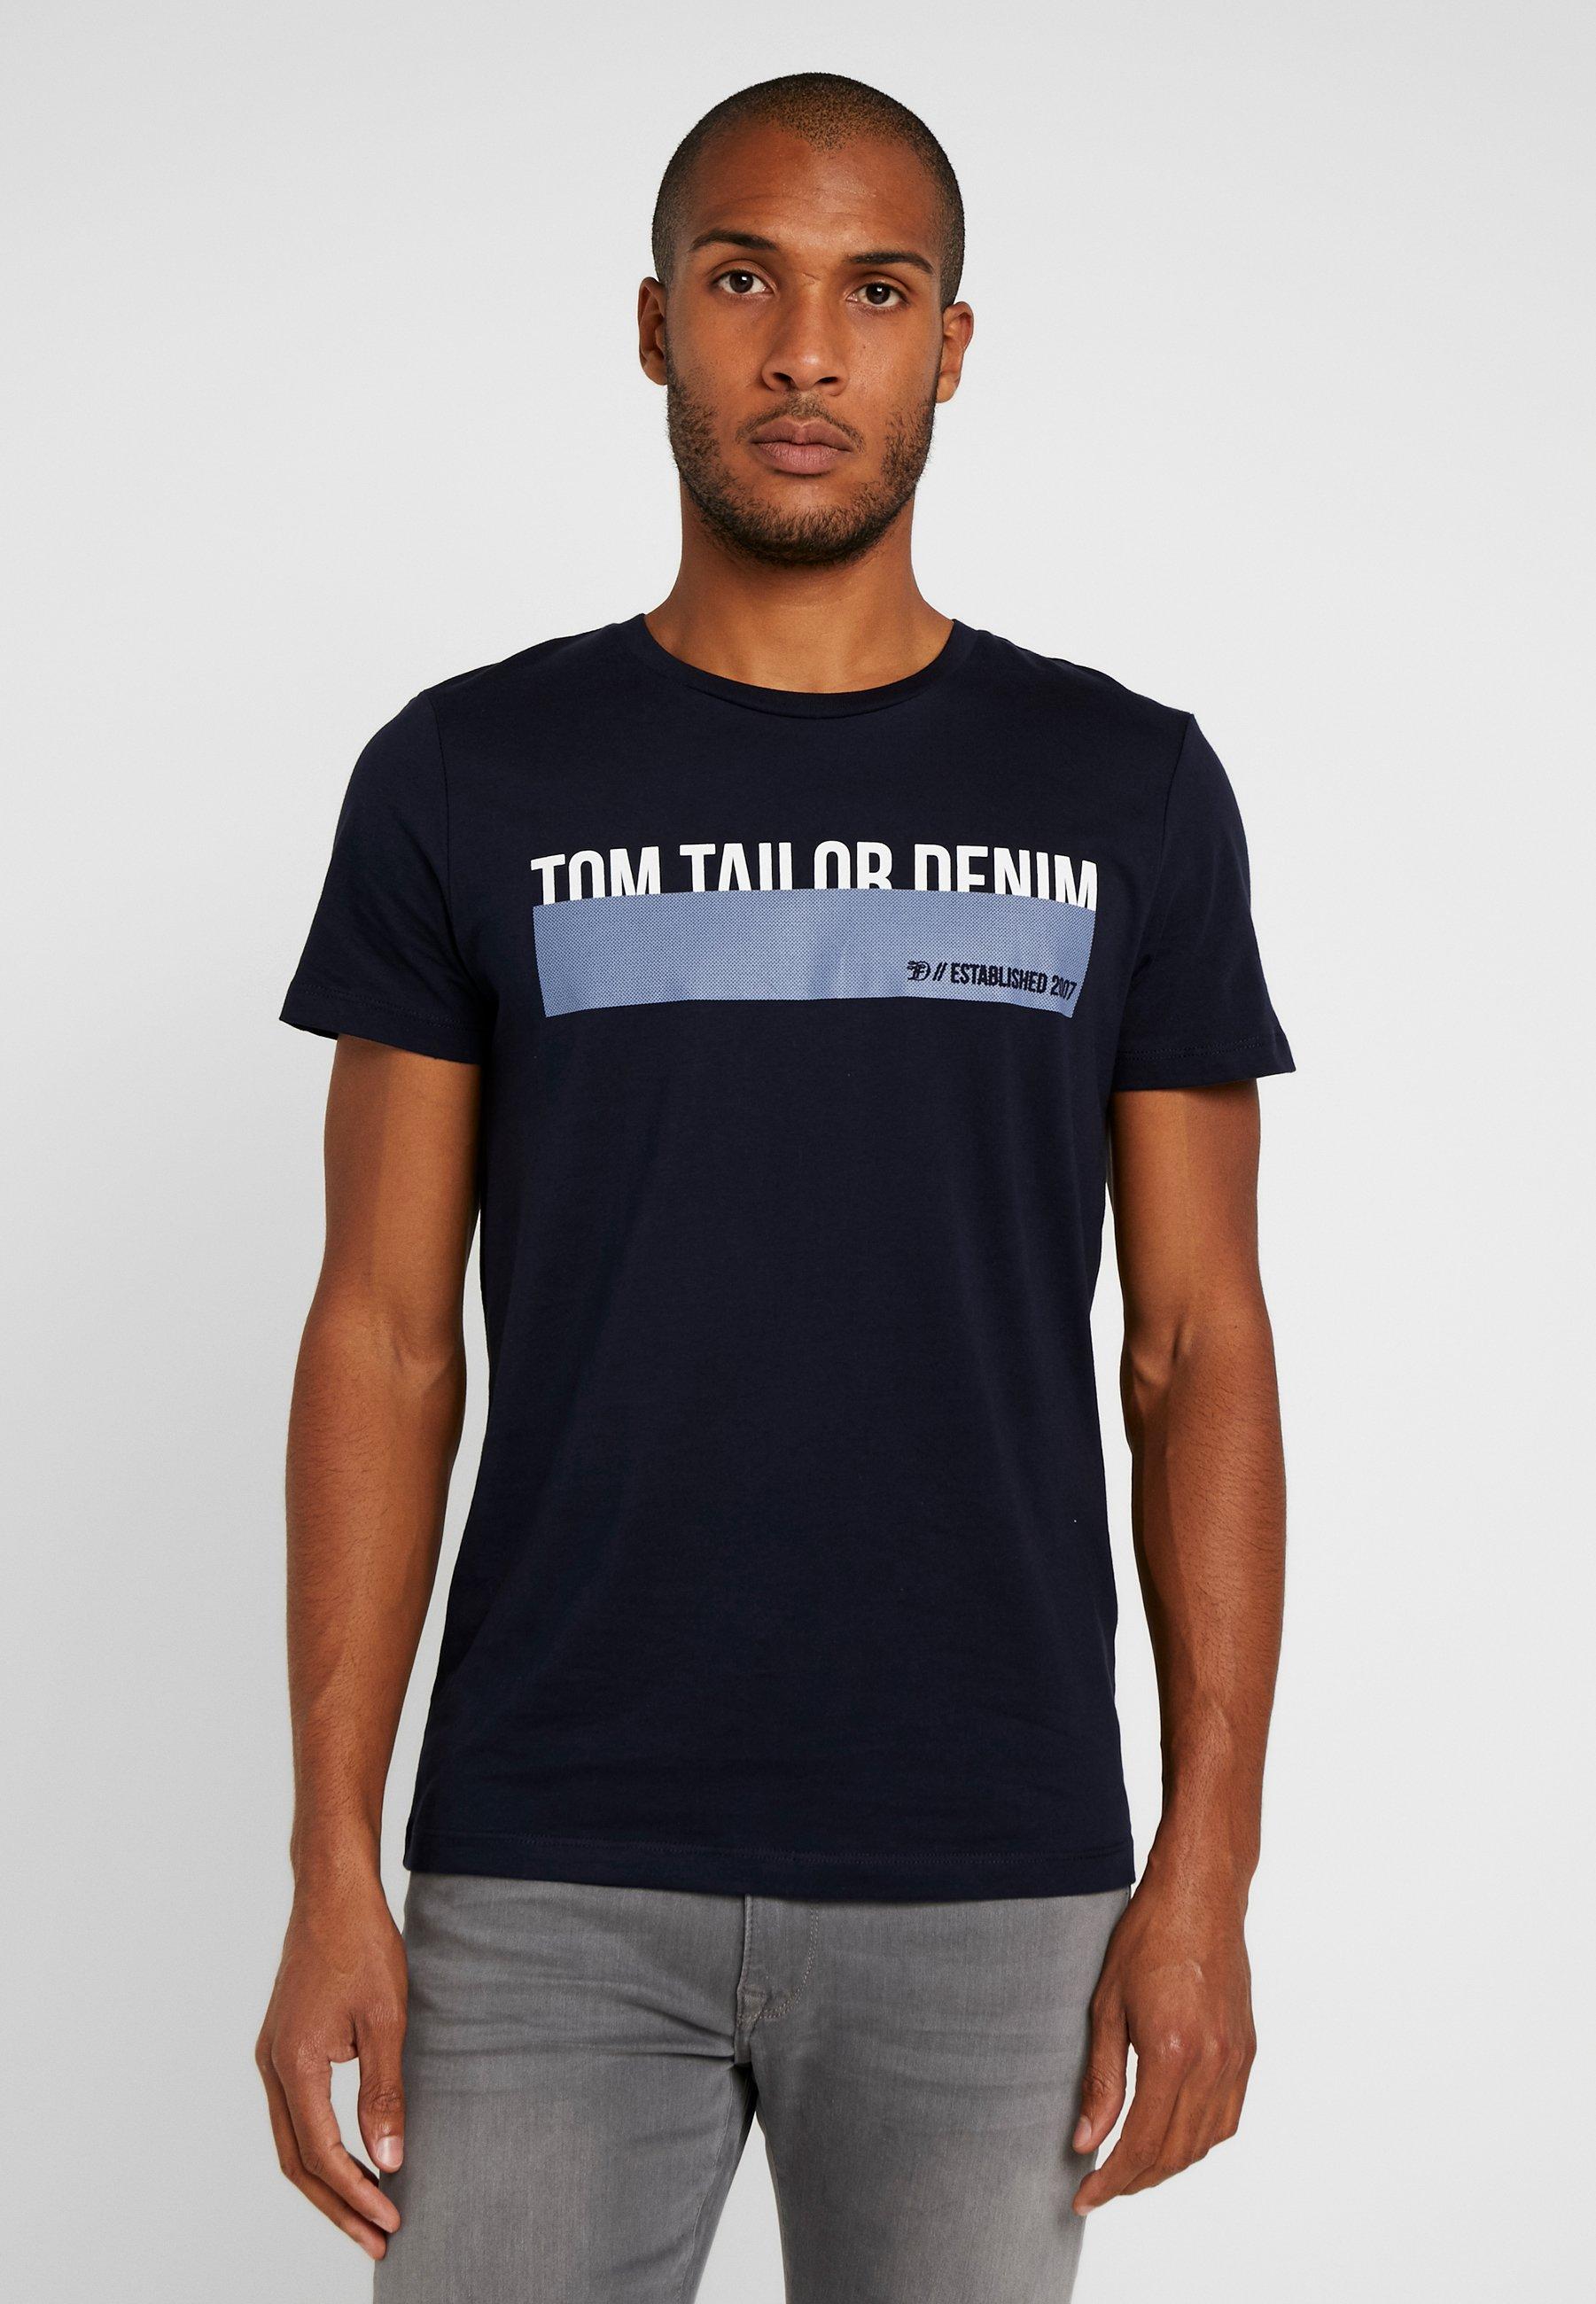 Tom Tailor Denim Maglia Uomo